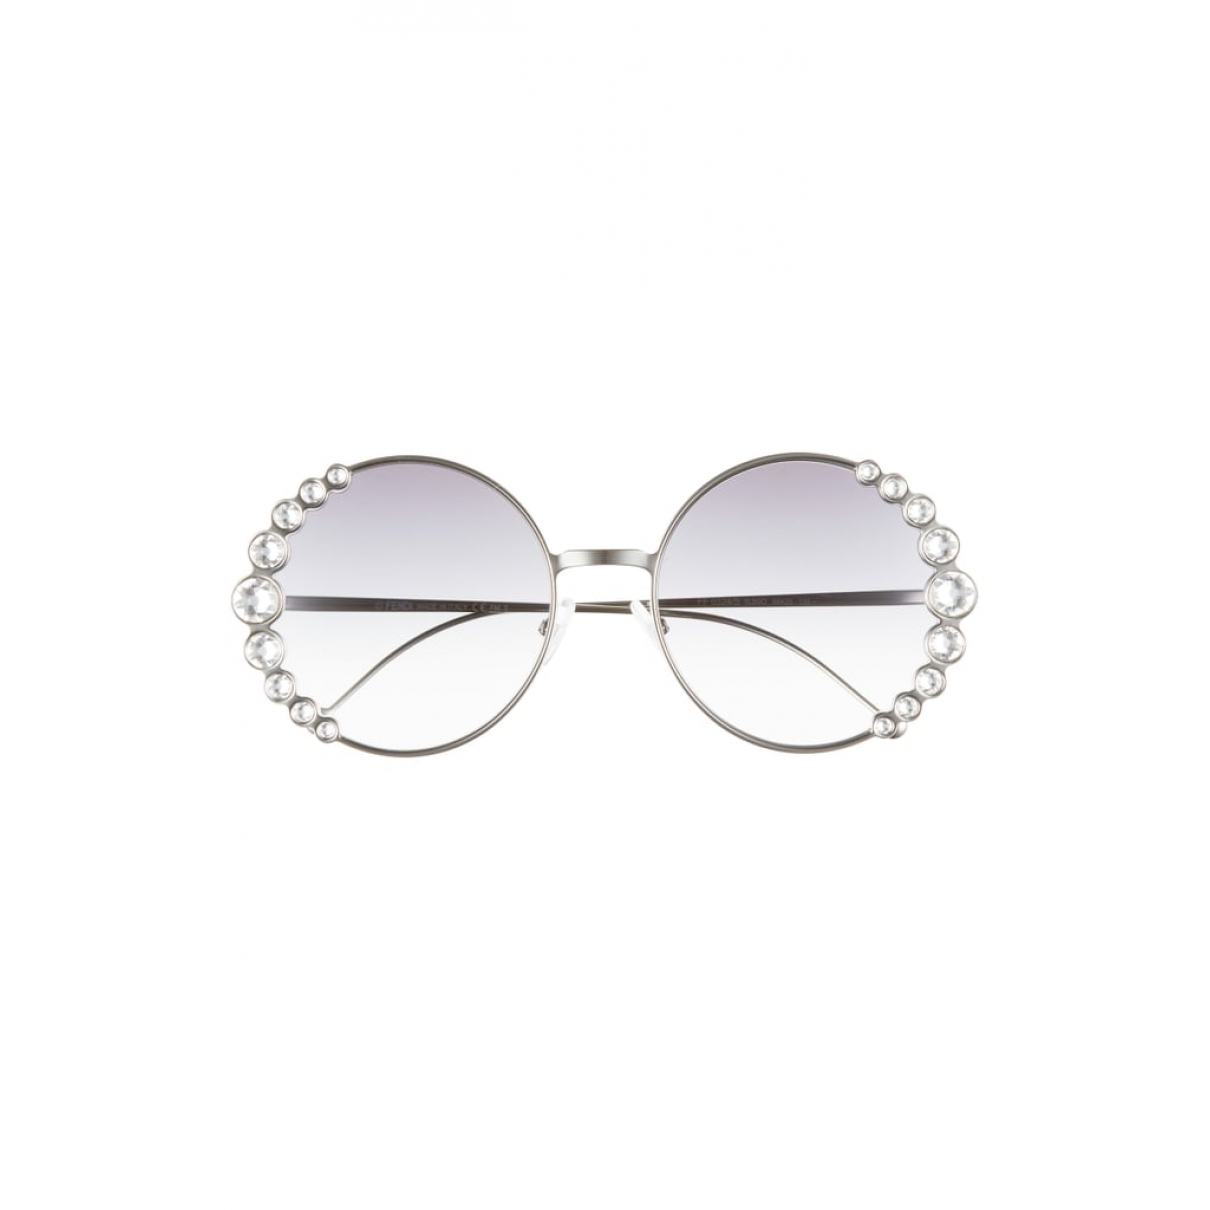 Fendi \N Silver Metal Sunglasses for Women \N